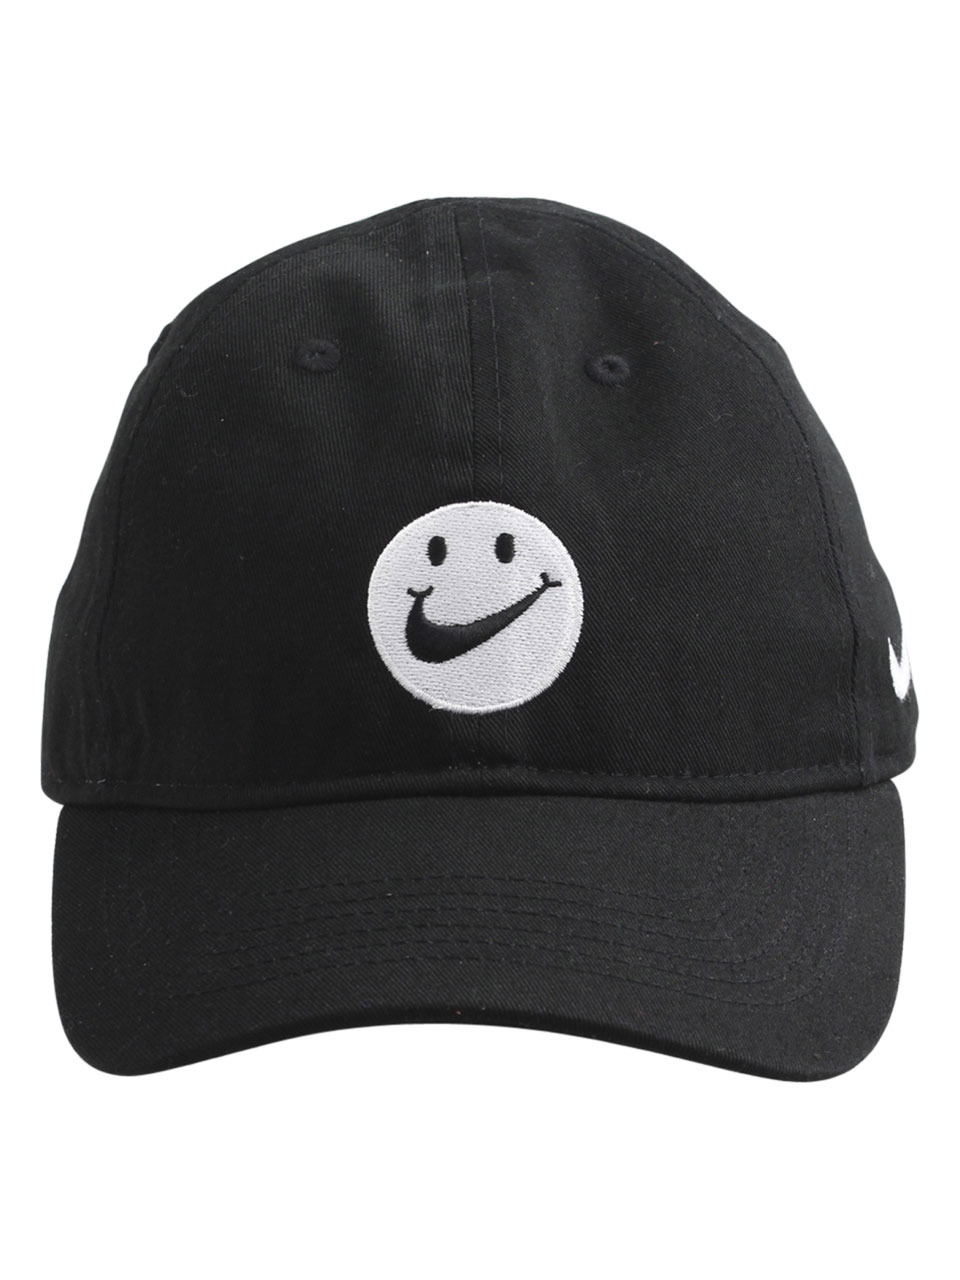 Nike Little Kid s Swoosh Patch Strapback Cotton Baseball Cap Hat  deb61a7b704